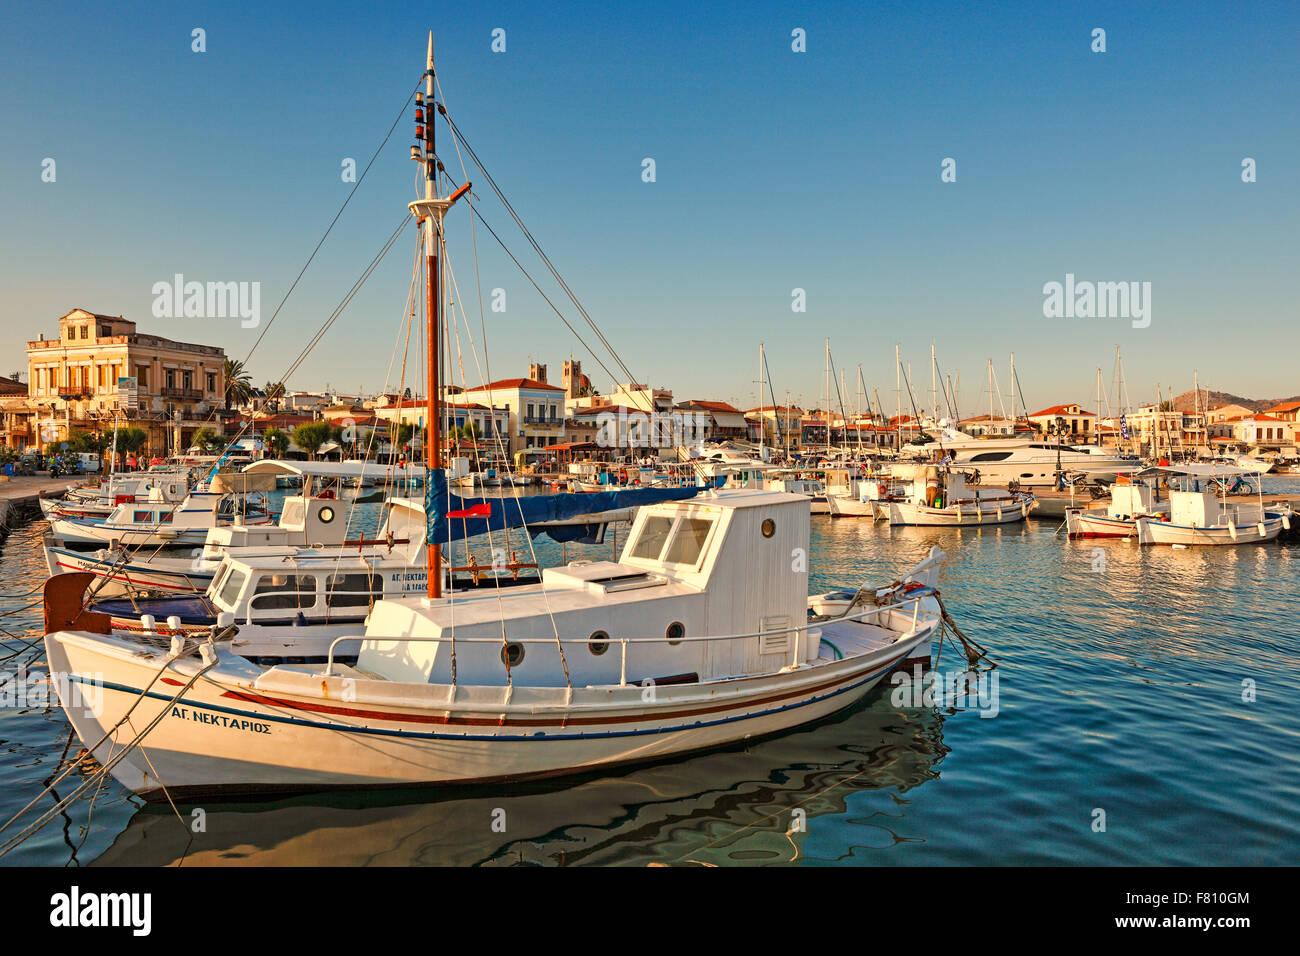 Boats in the port of Aegina island, Greece - Stock Image